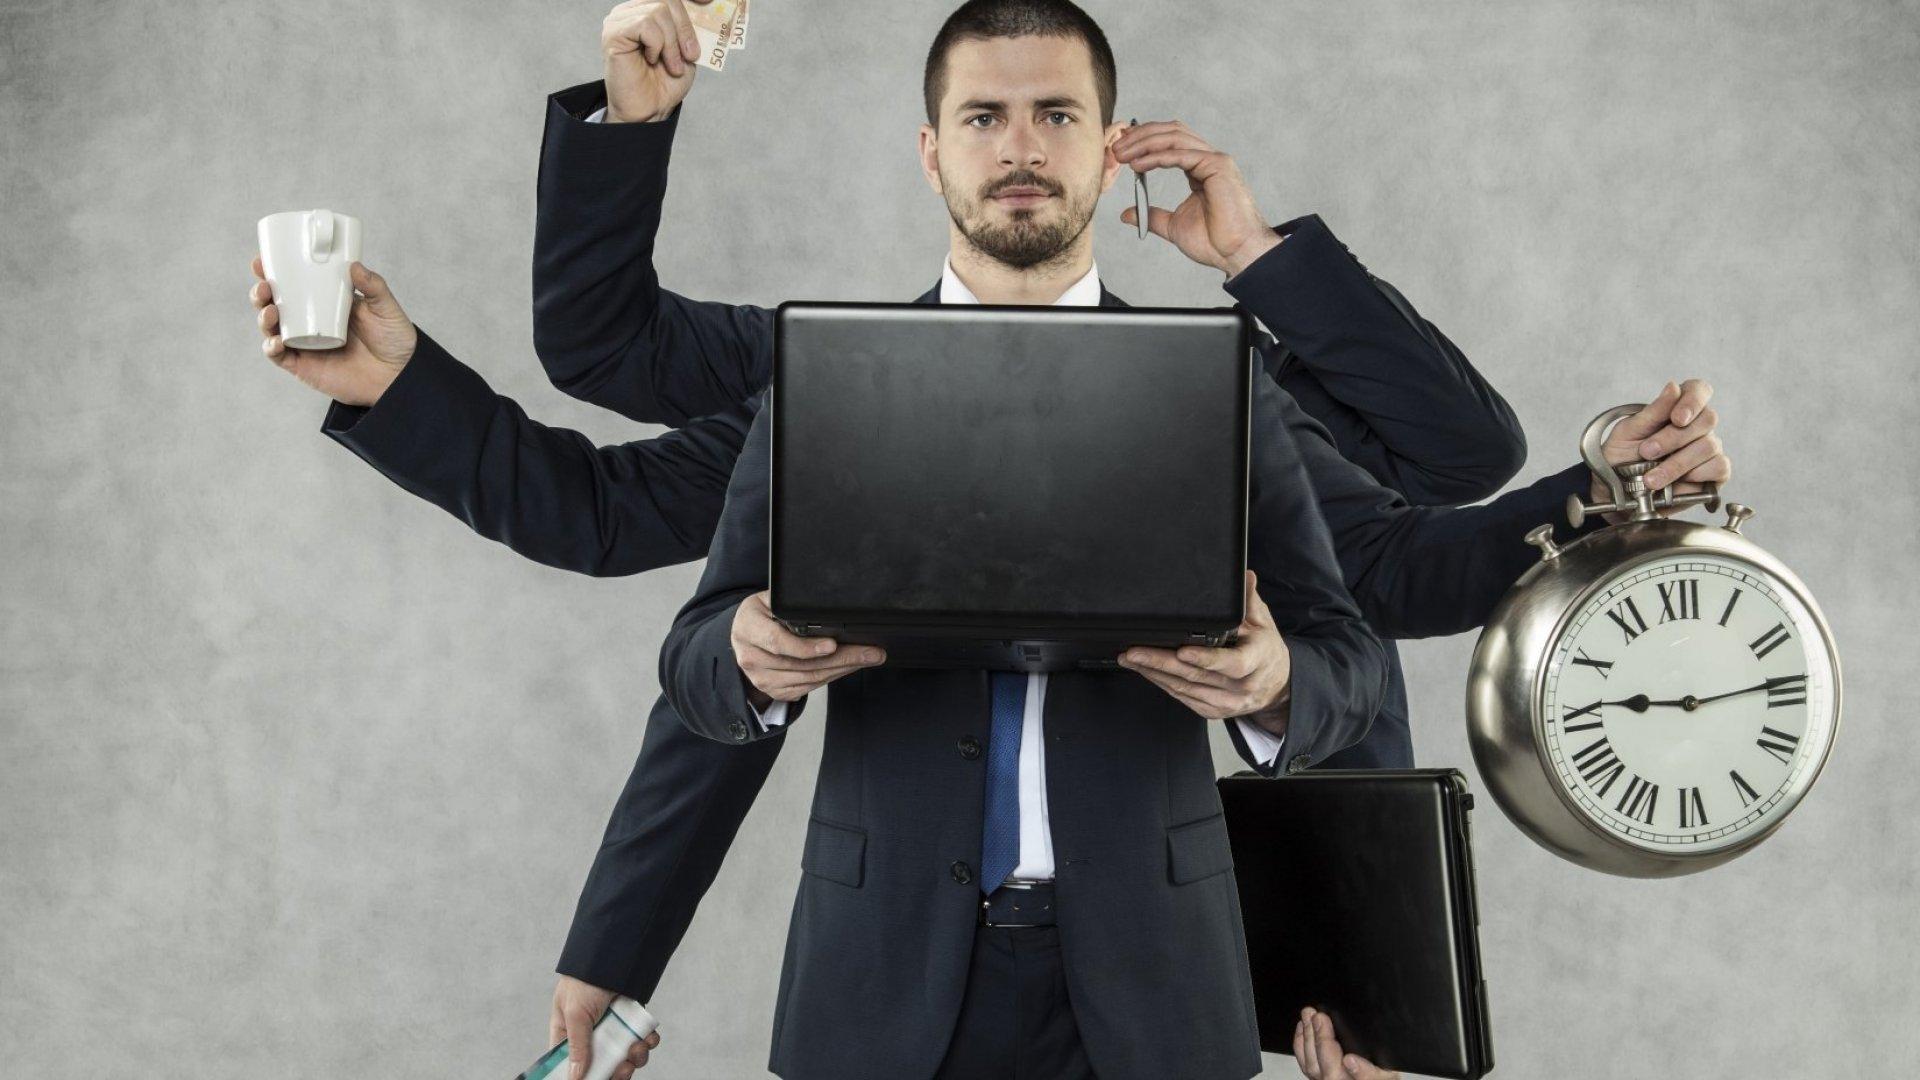 10 Quick Public Speaking Tips for Busy Entrepreneurs